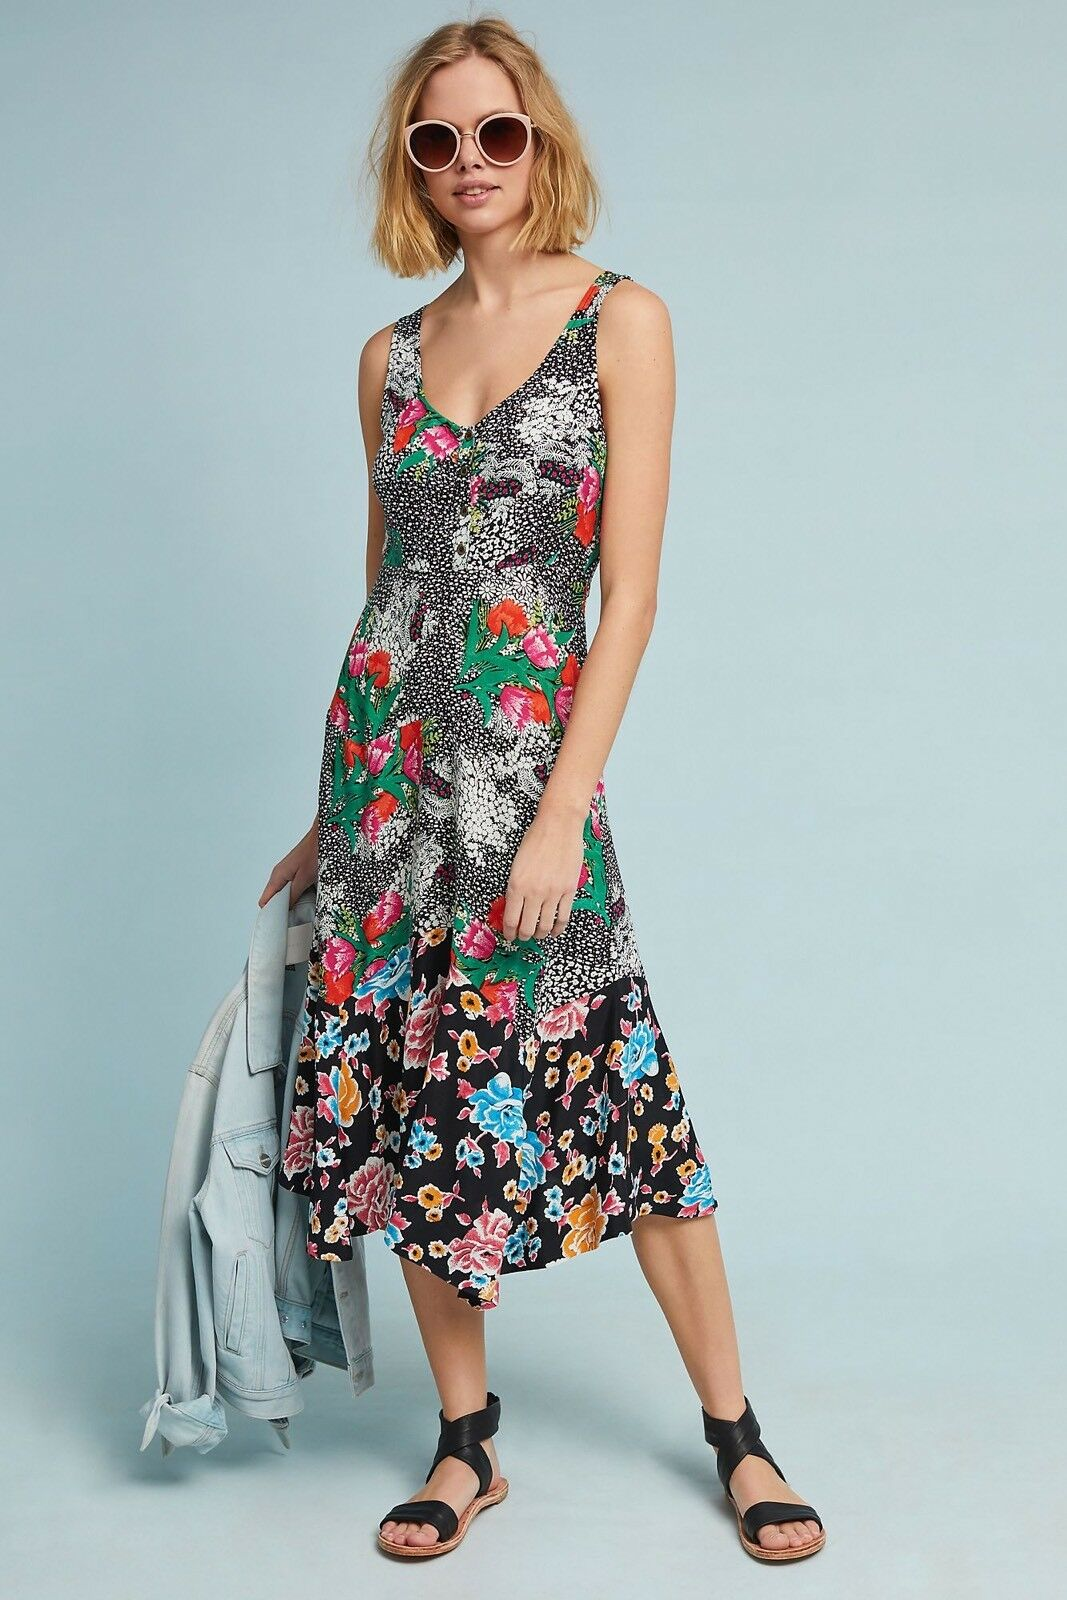 NWT ANTHROPOLOGIE lilate Midi Dress By Maeve Rosa Motif Größe 6